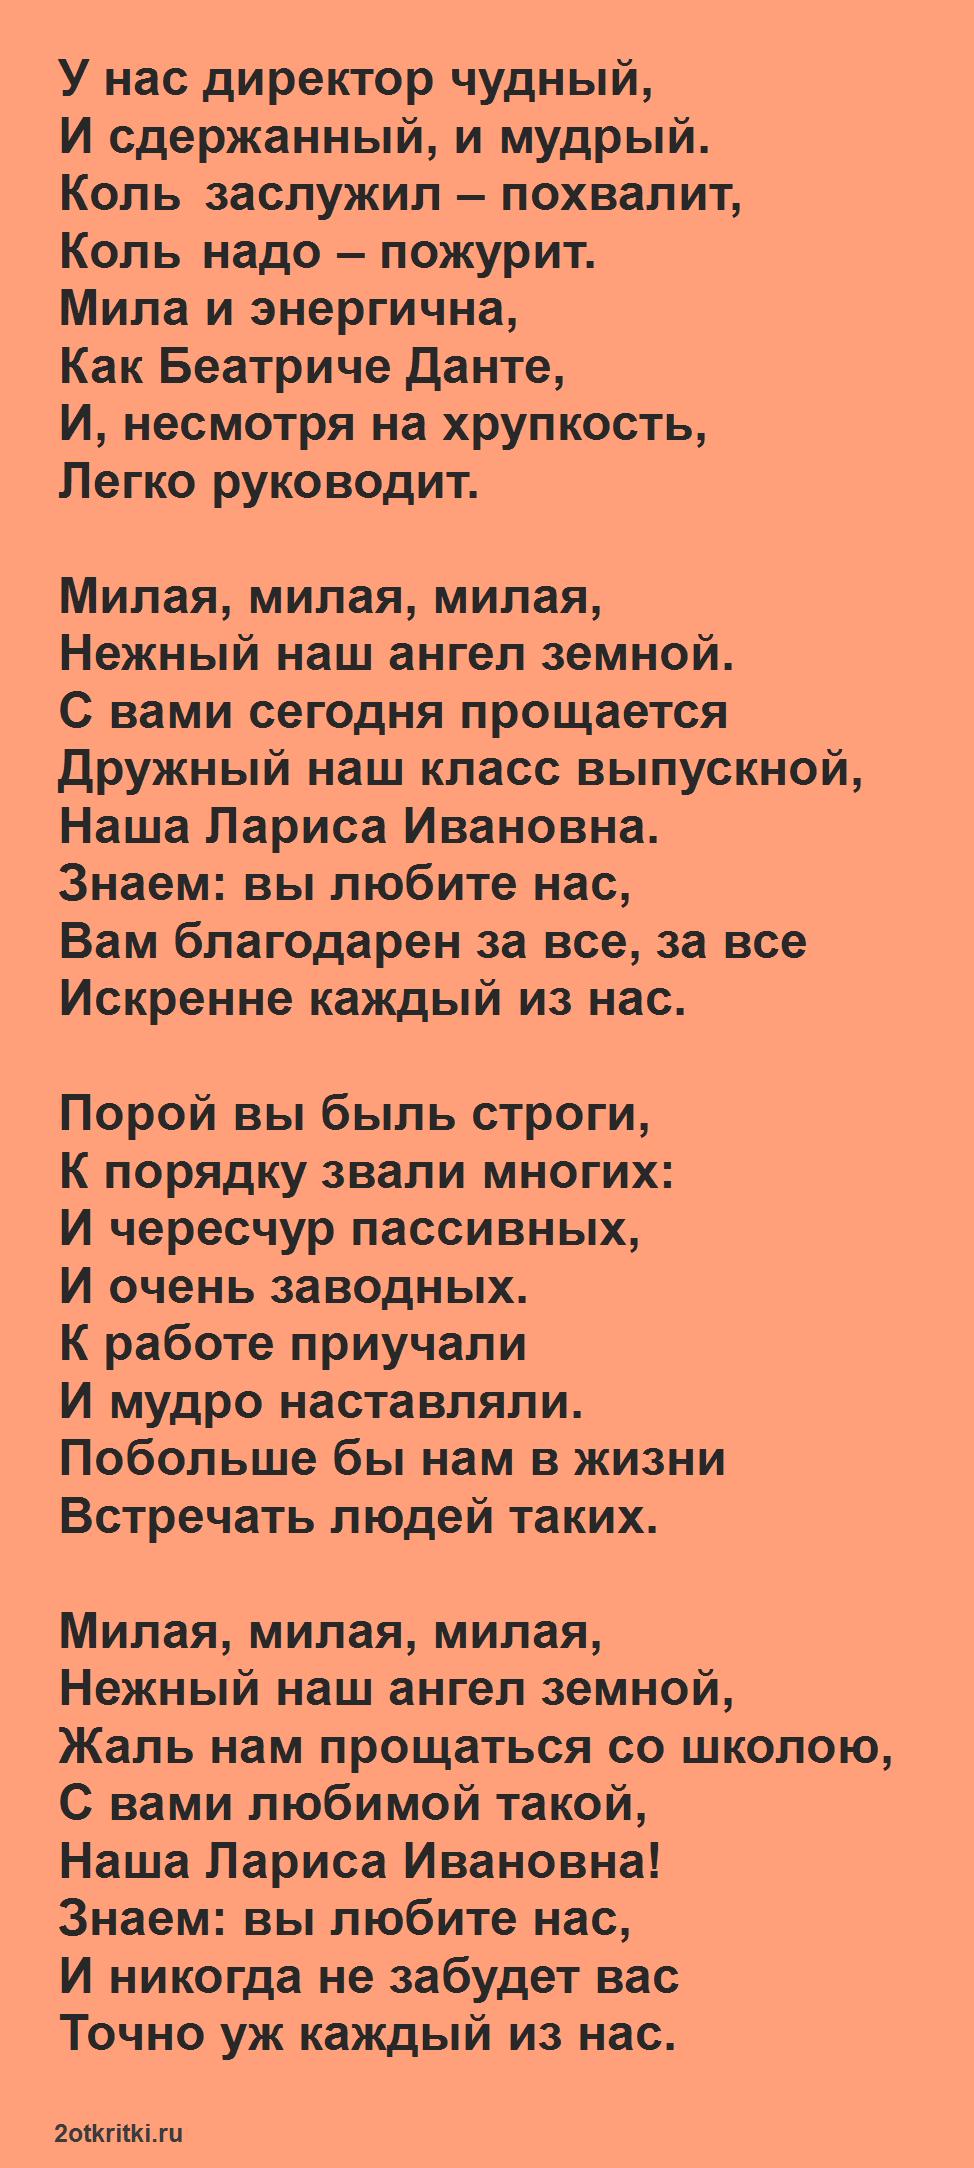 Песня переделка директору на последний звонок - на мотив песни 'Милая'